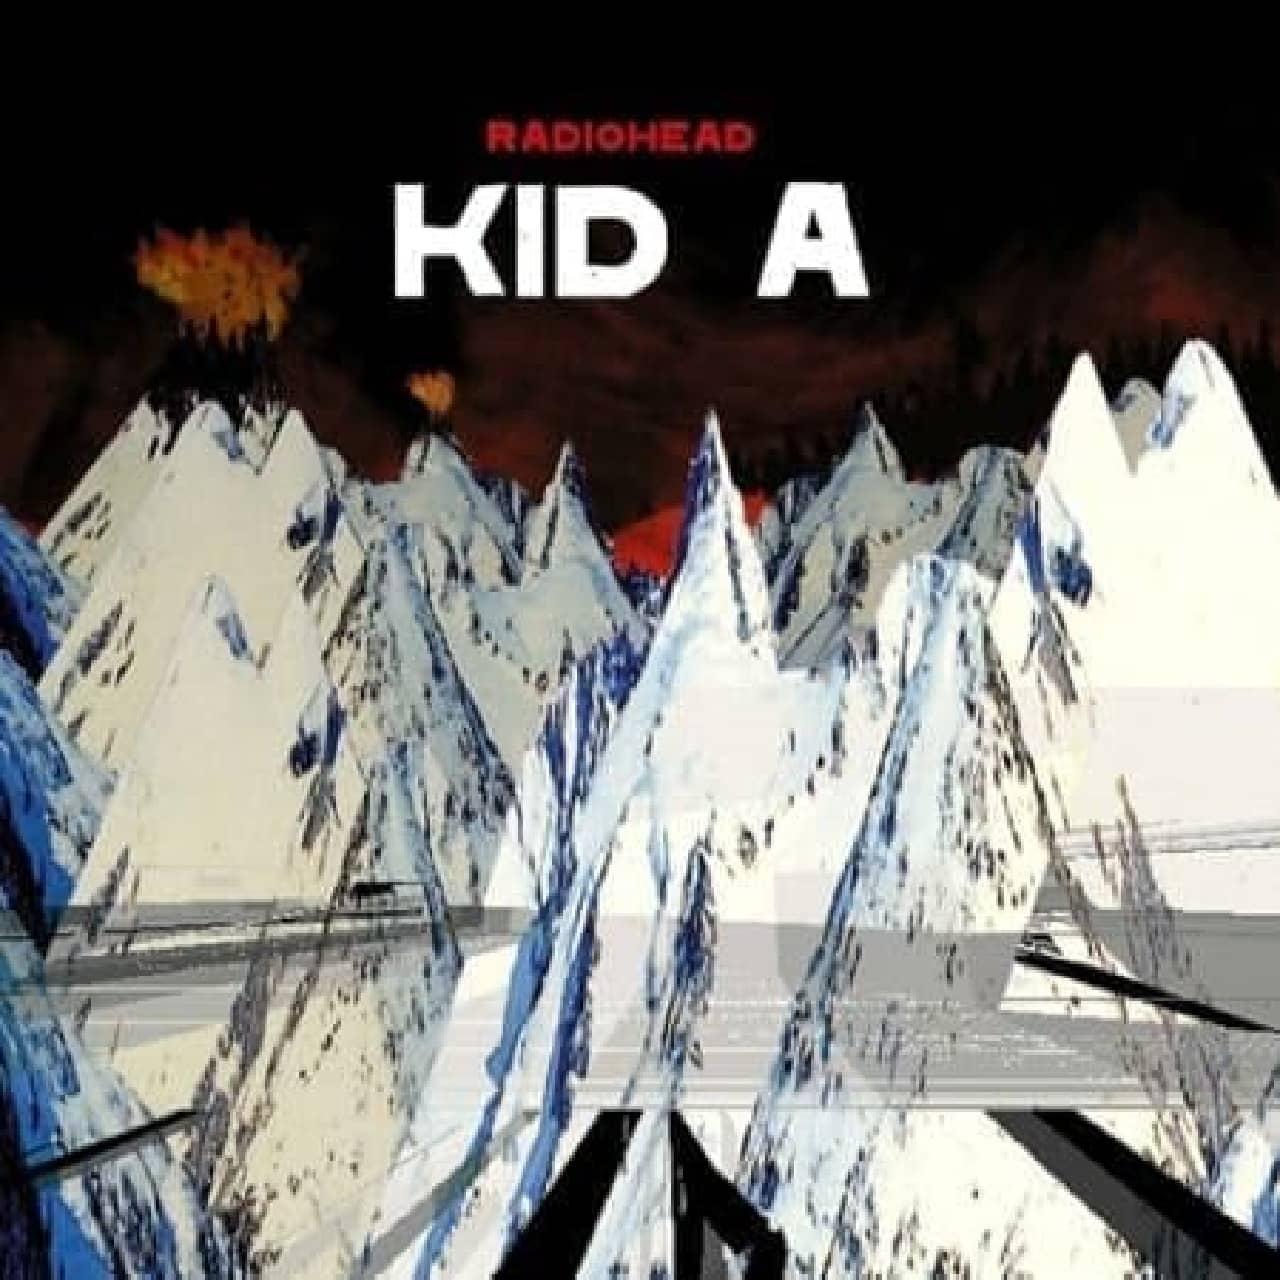 Radiohead アルバム「Kid A」  (出典:Radiohead 公式サイト)